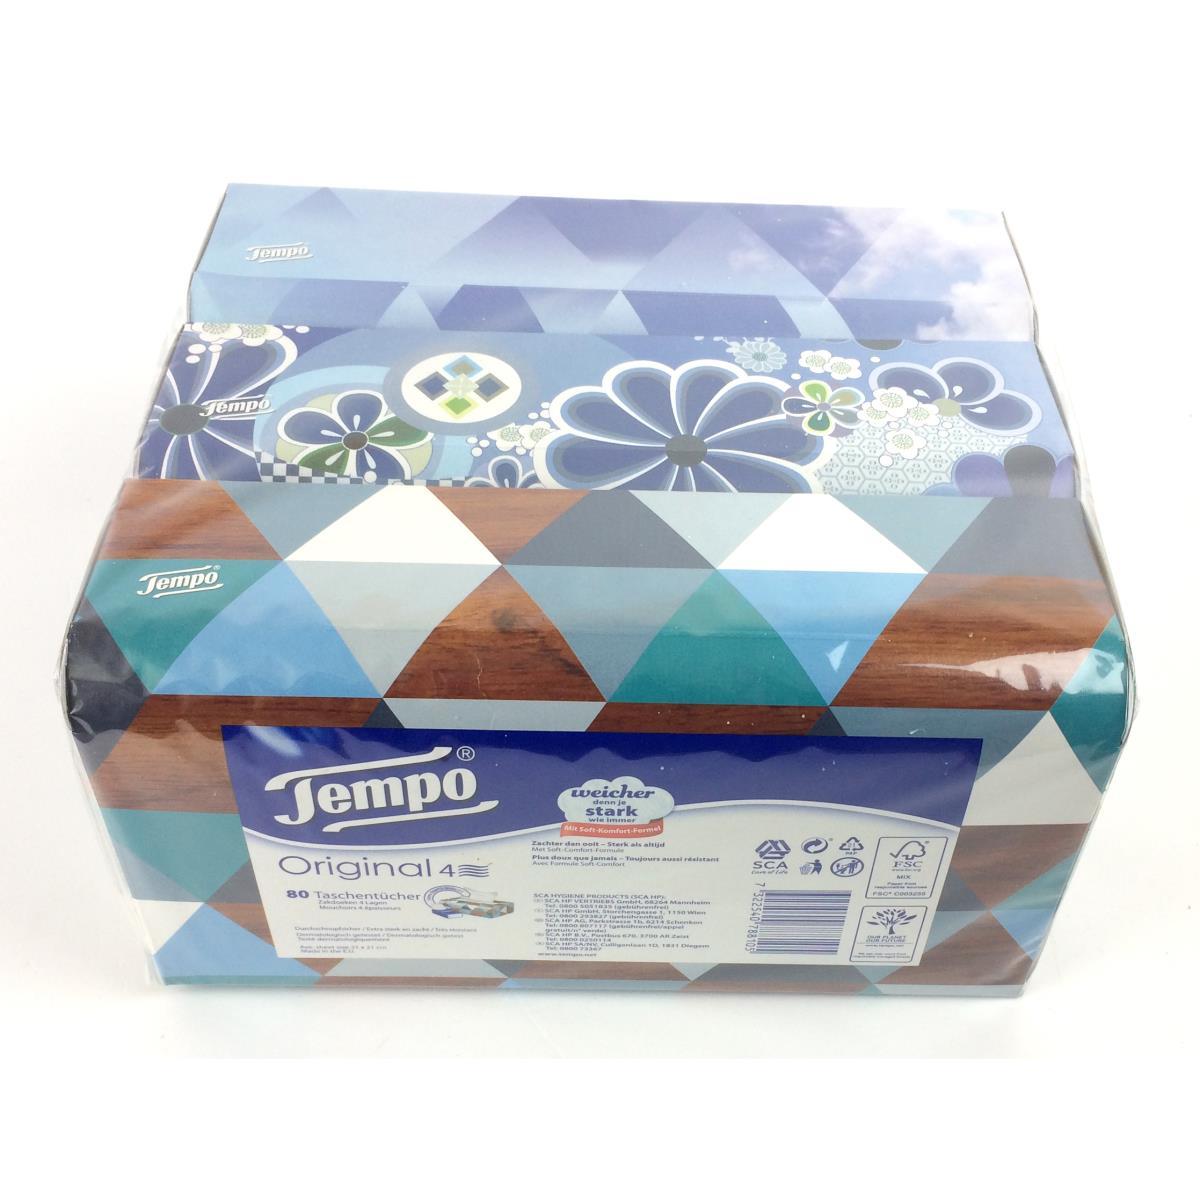 tempo taschent cher trio box 4 lagig kosmetikt cher 3 x 80 t cher. Black Bedroom Furniture Sets. Home Design Ideas